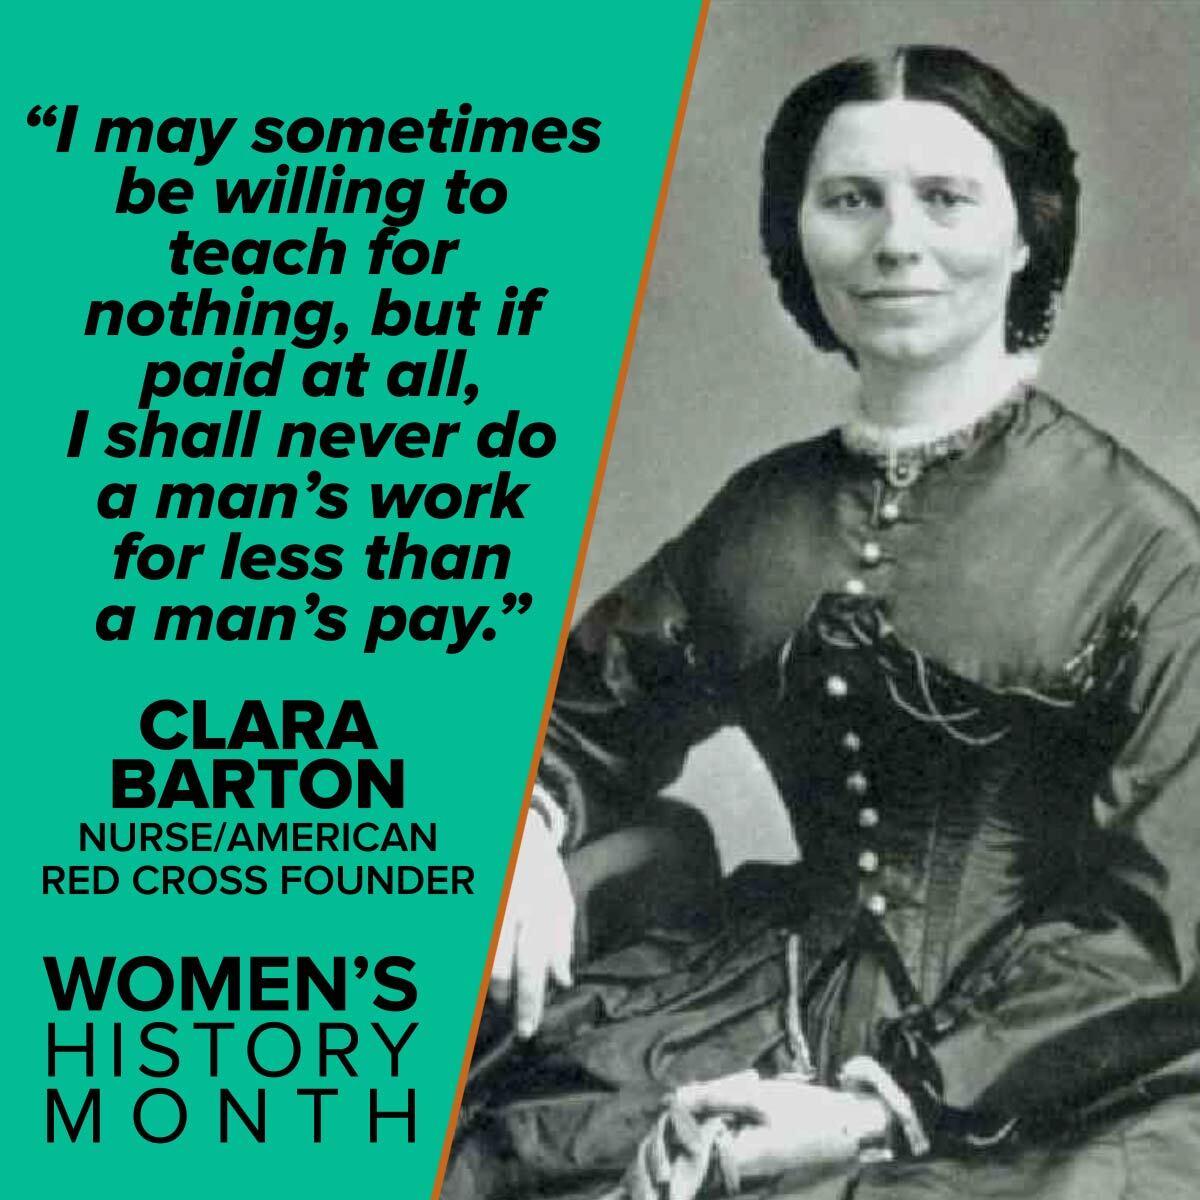 Women's History Month_Clara Barton.jpg